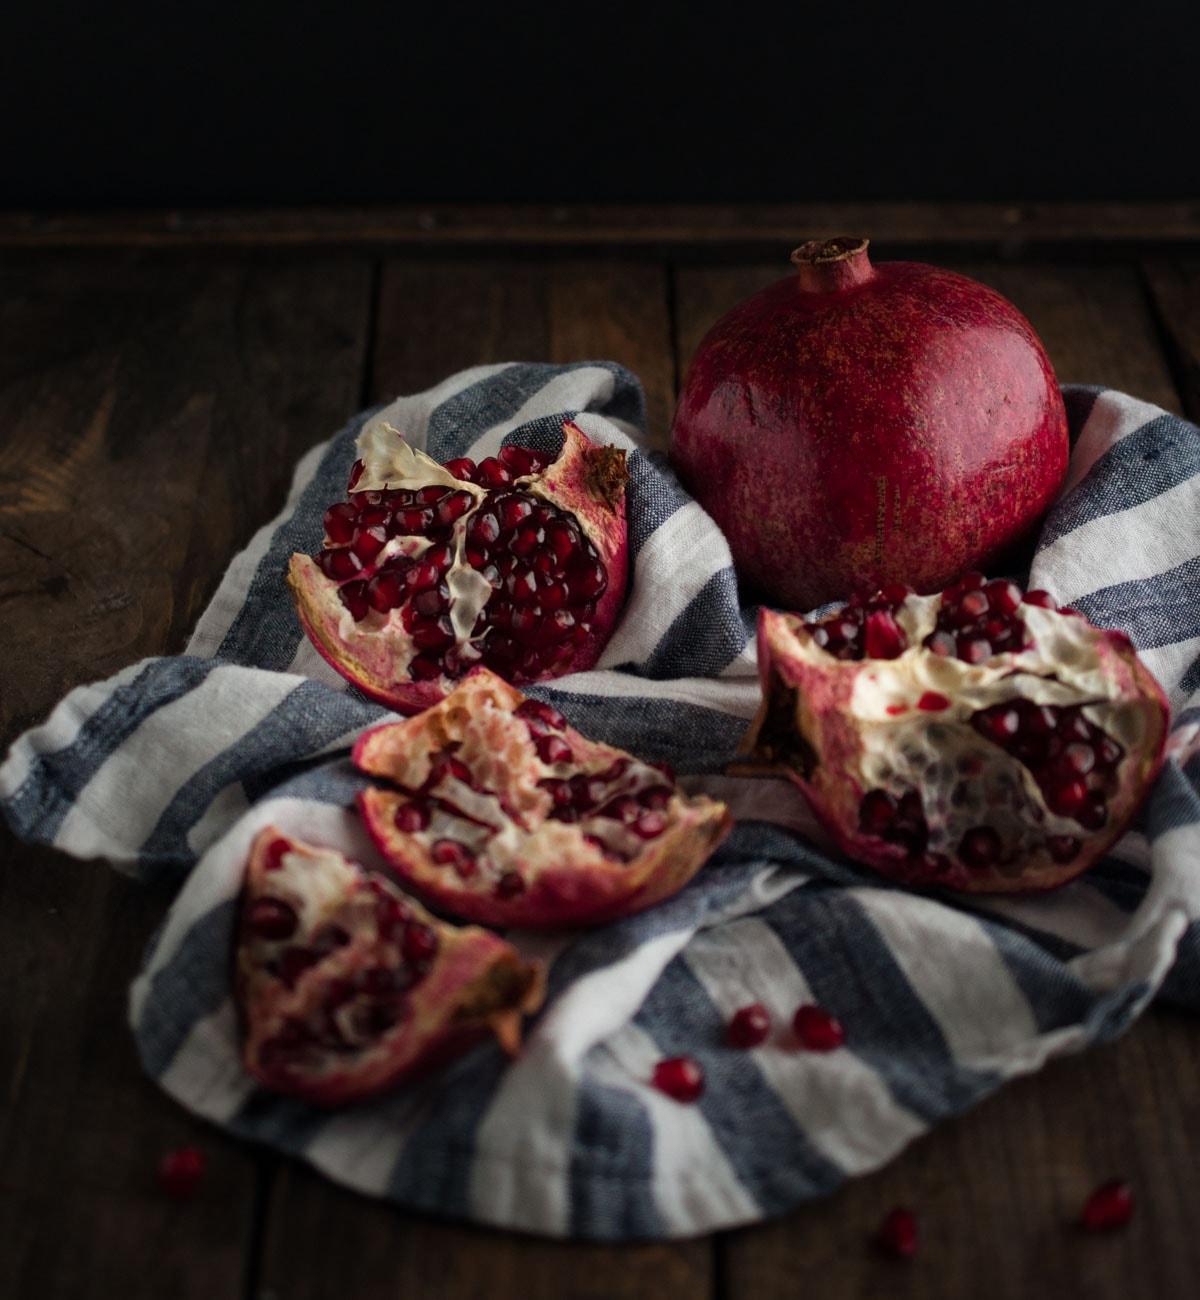 Dark Chocolate Pomegranate Bites - Feasting not Fasting